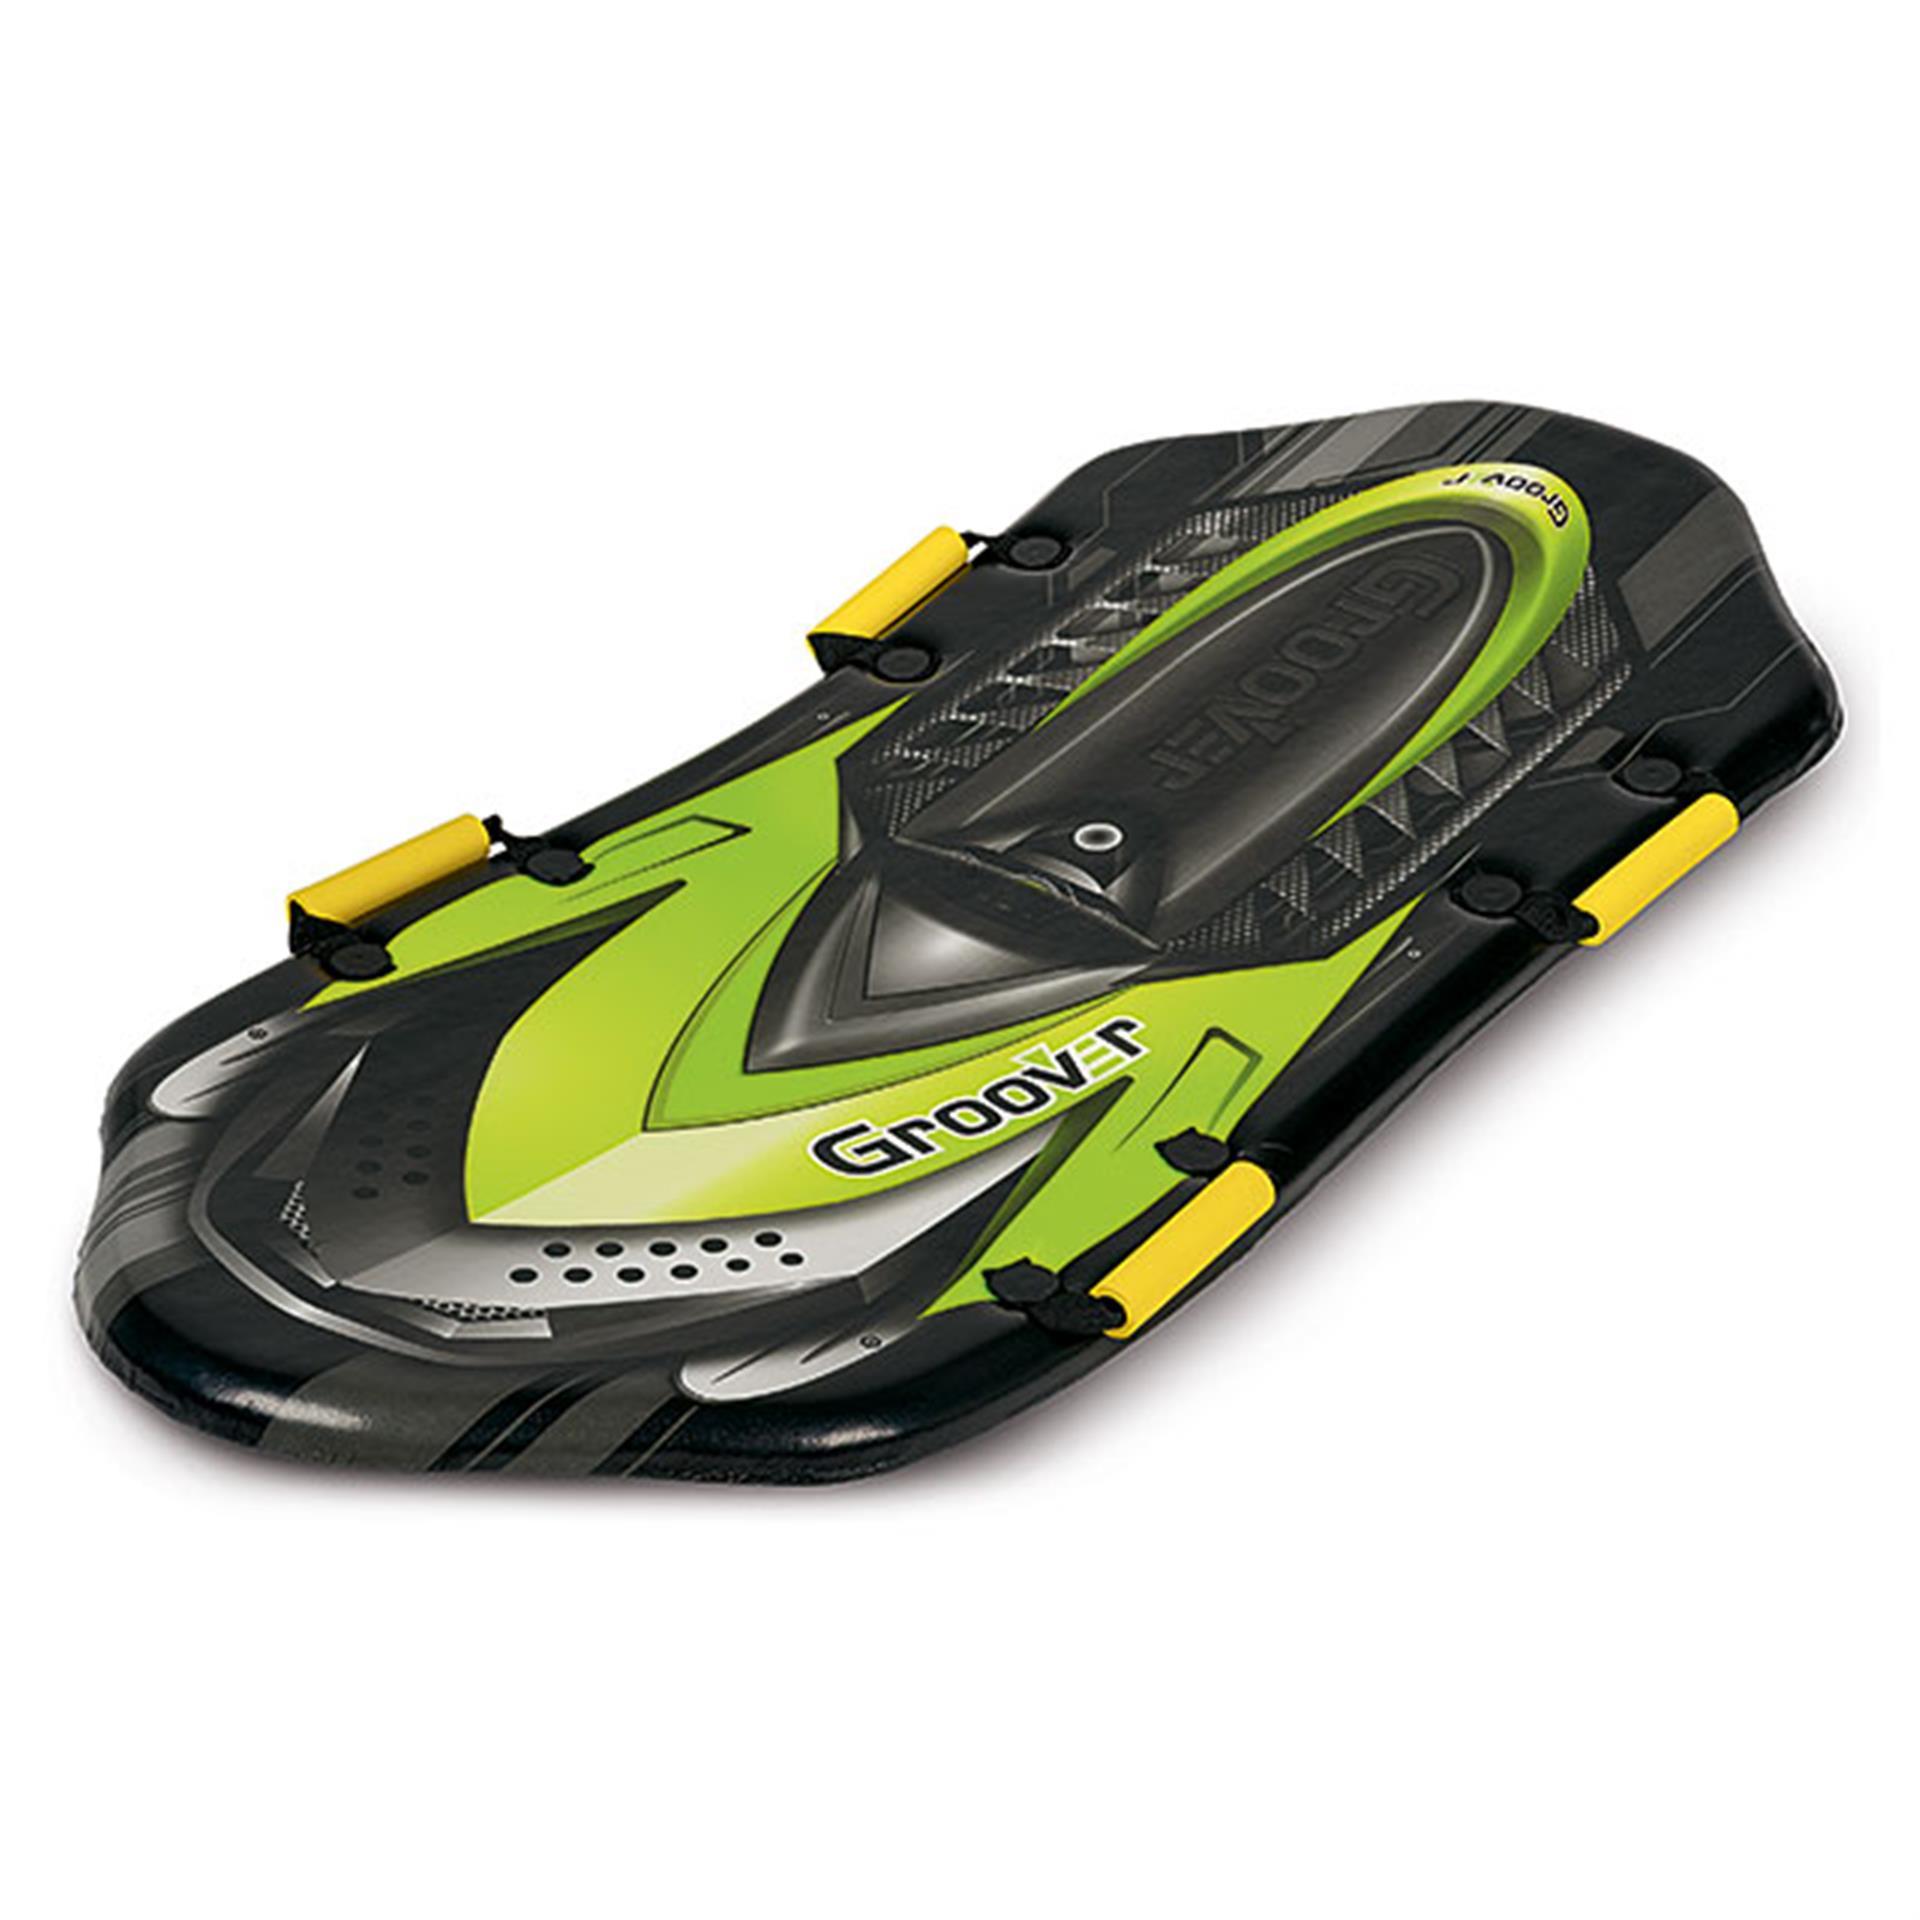 Bodyboard Snow Groover